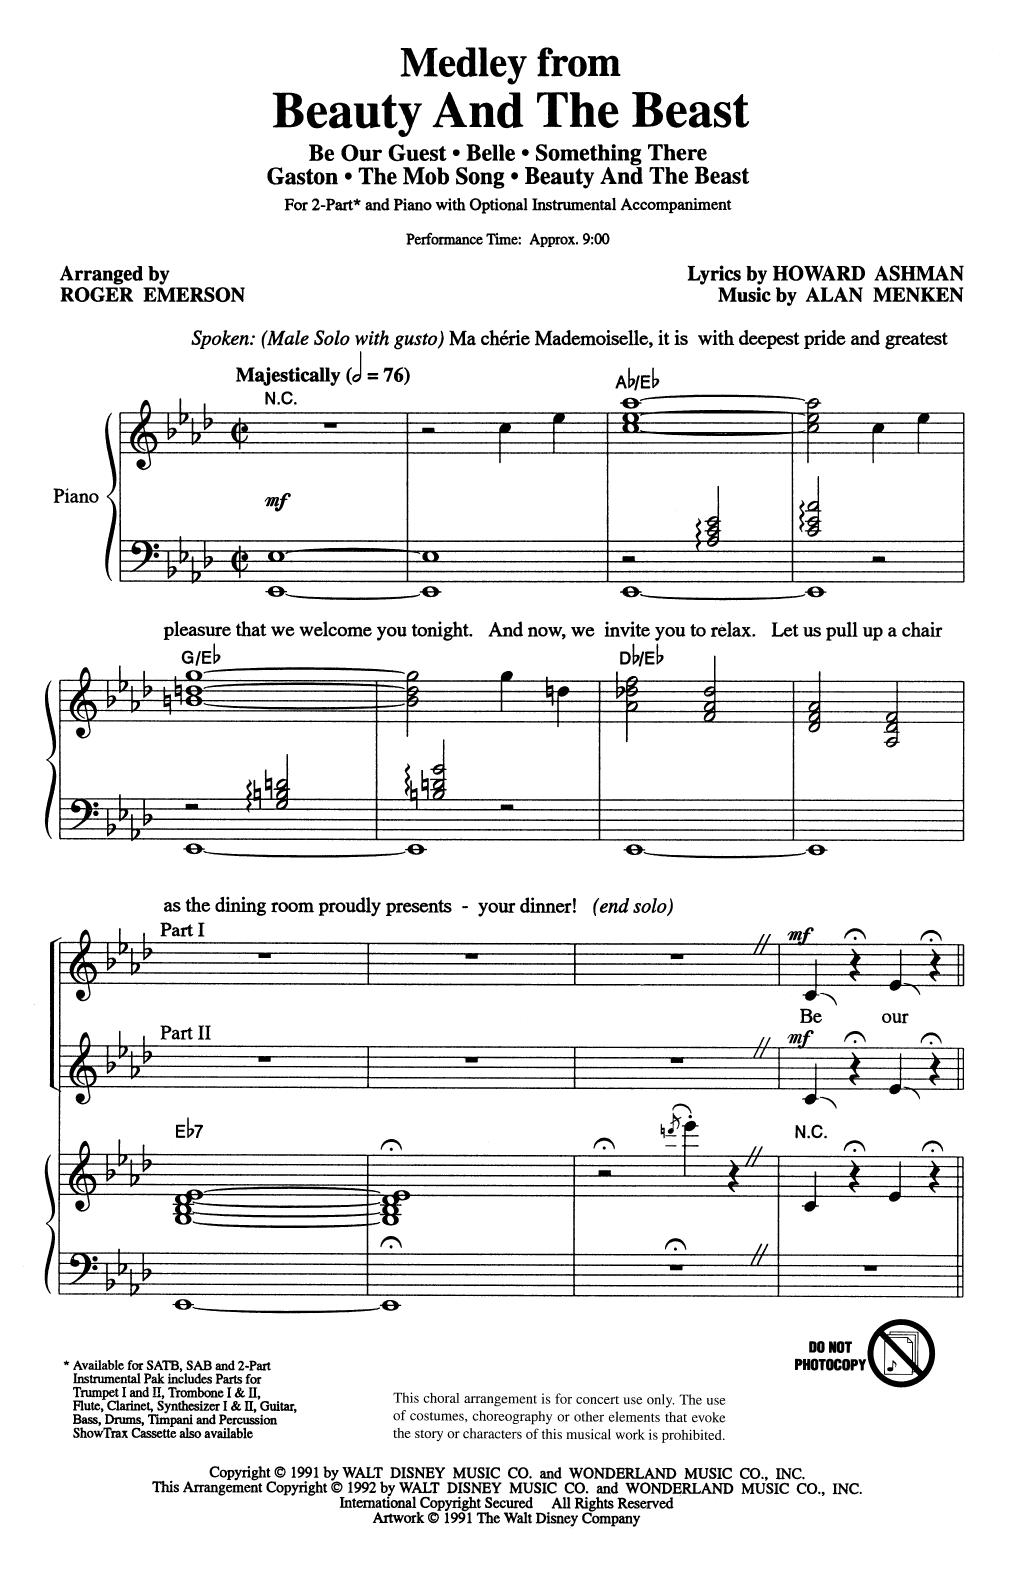 Beauty And The Beast (Medley) (arr. Roger Emerson) (2-Part Choir)